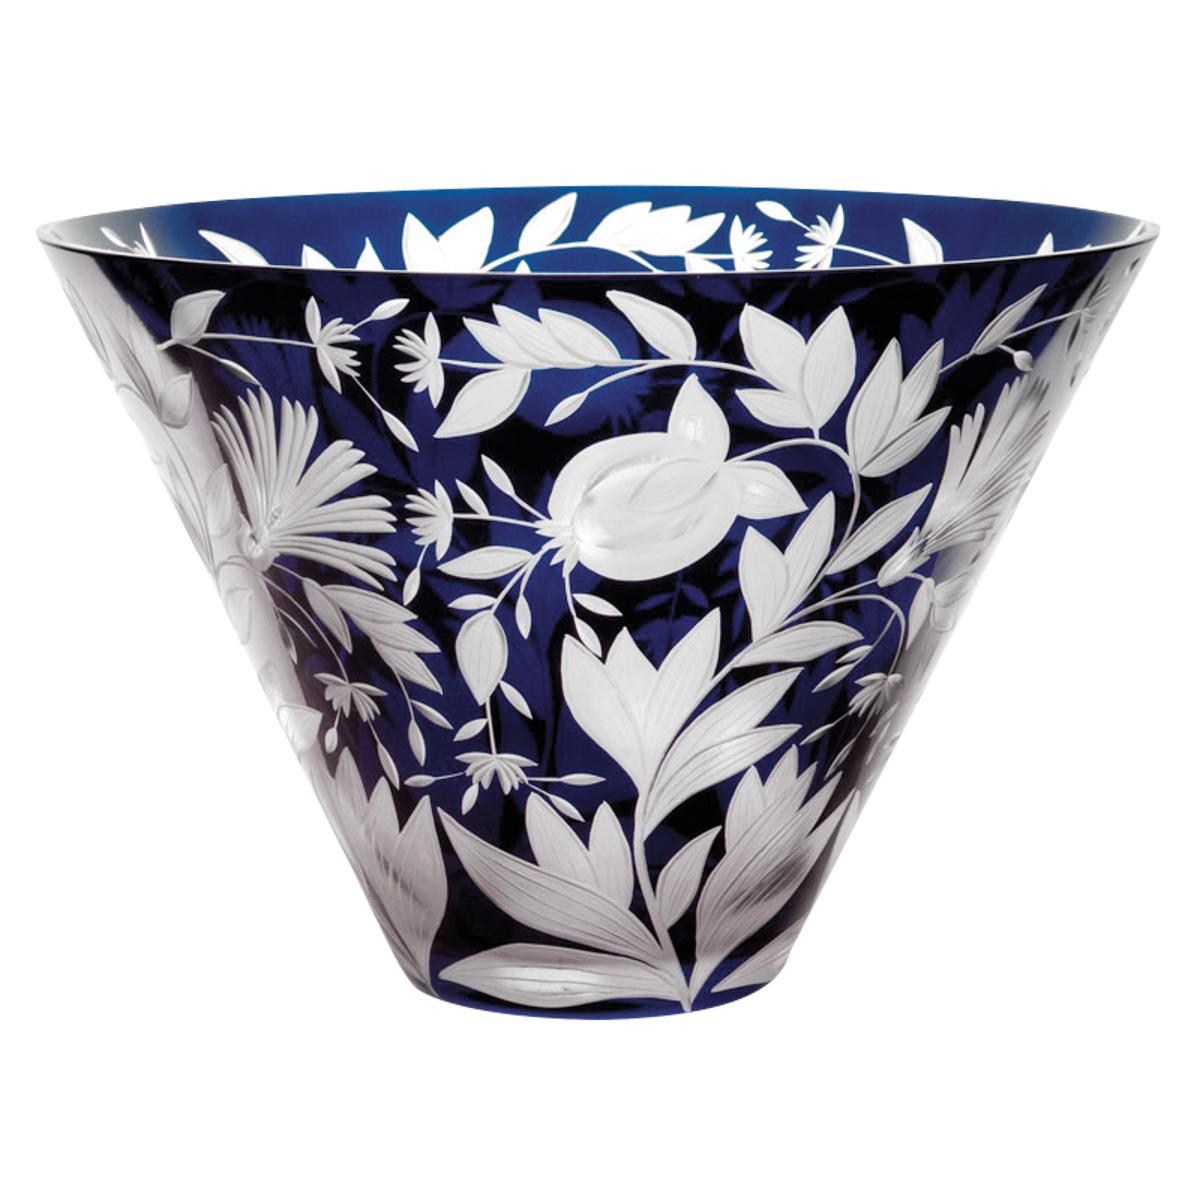 Verdure Large Bowl in Azure by Vera Mauricova & Karen Feldman